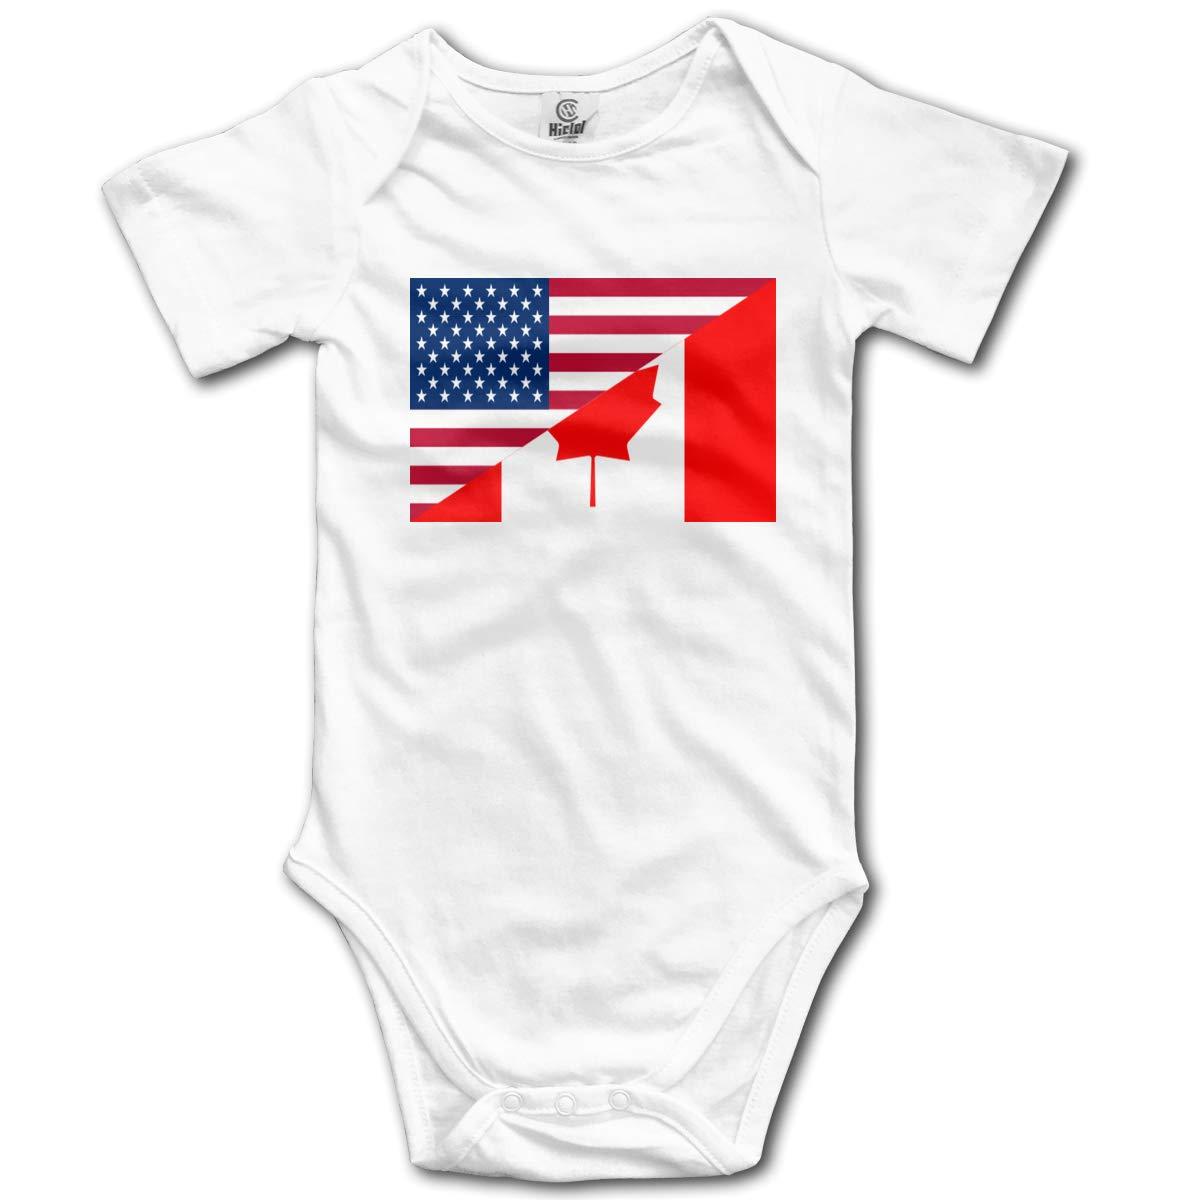 American and Canada Flag Newborn Infant Toddler Baby Girls Boys Bodysuit Short Sleeve 0-24 MonthsBlack